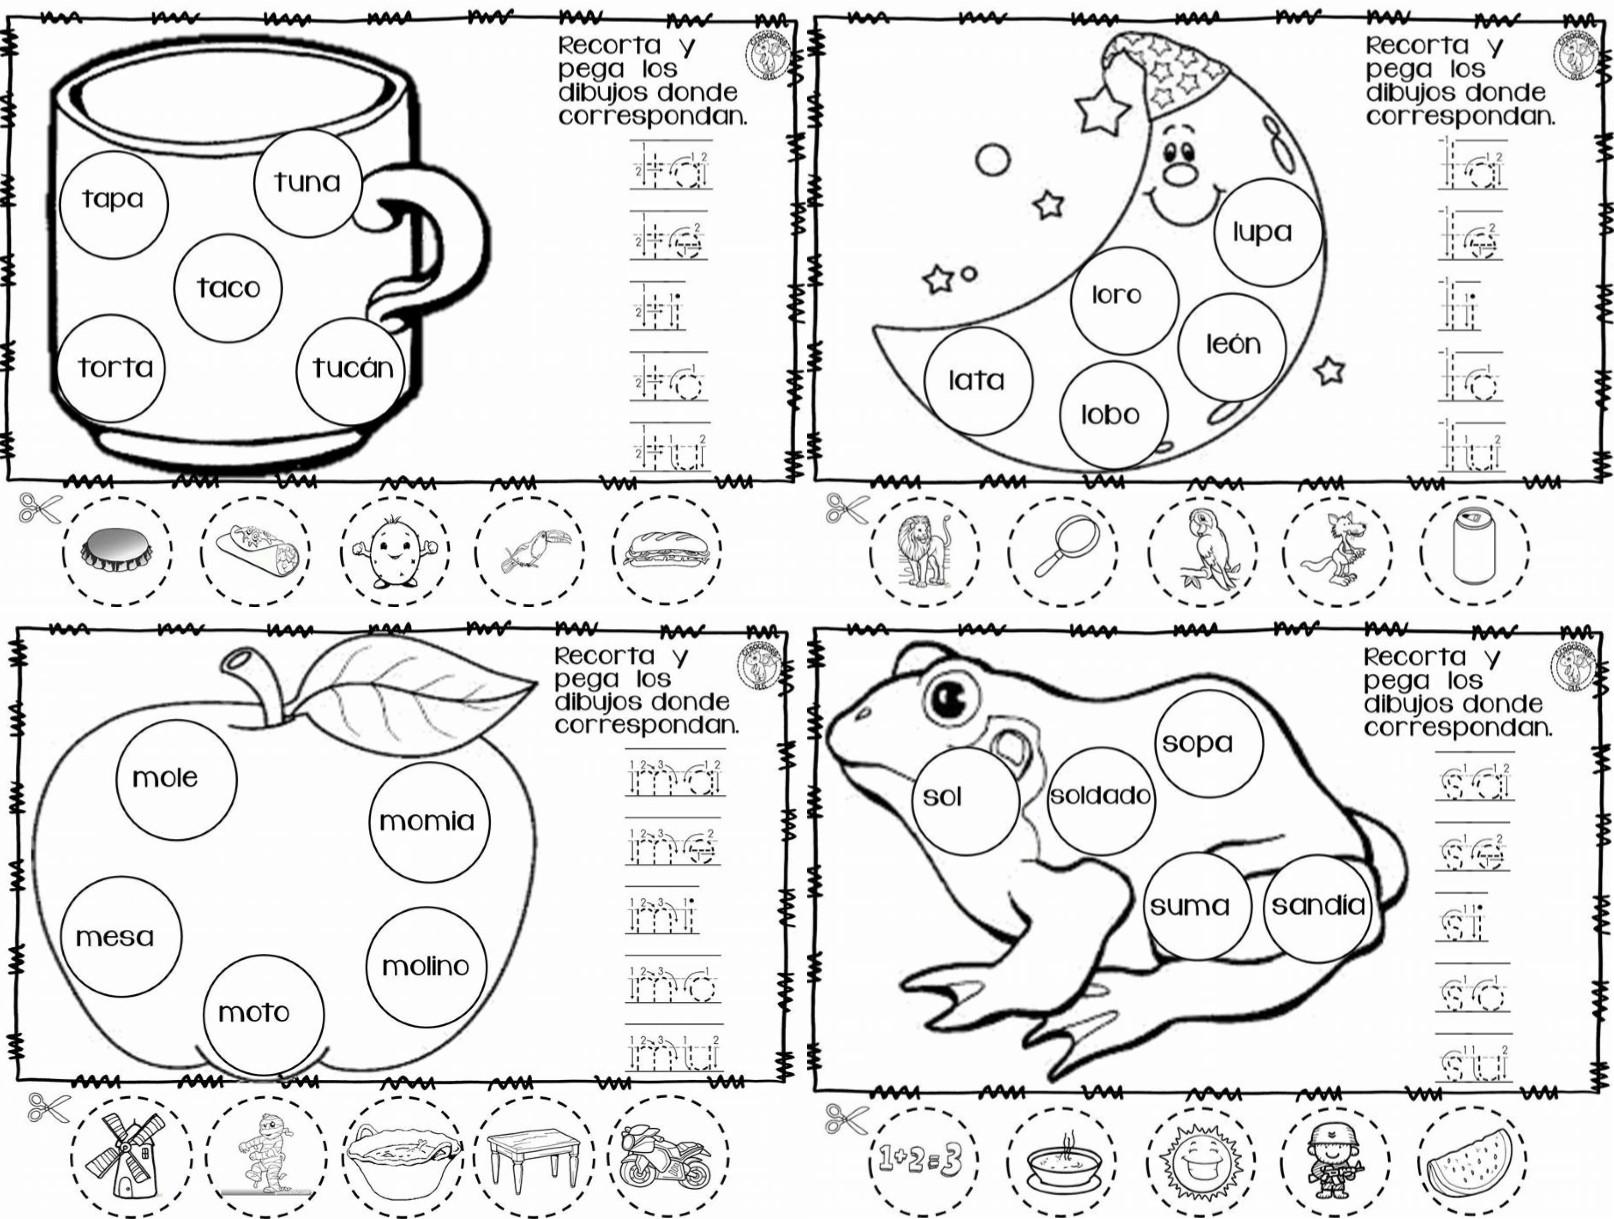 Yamahaoemfactorycolorwiringdiagramschematic1984xt250lxt250lc Data